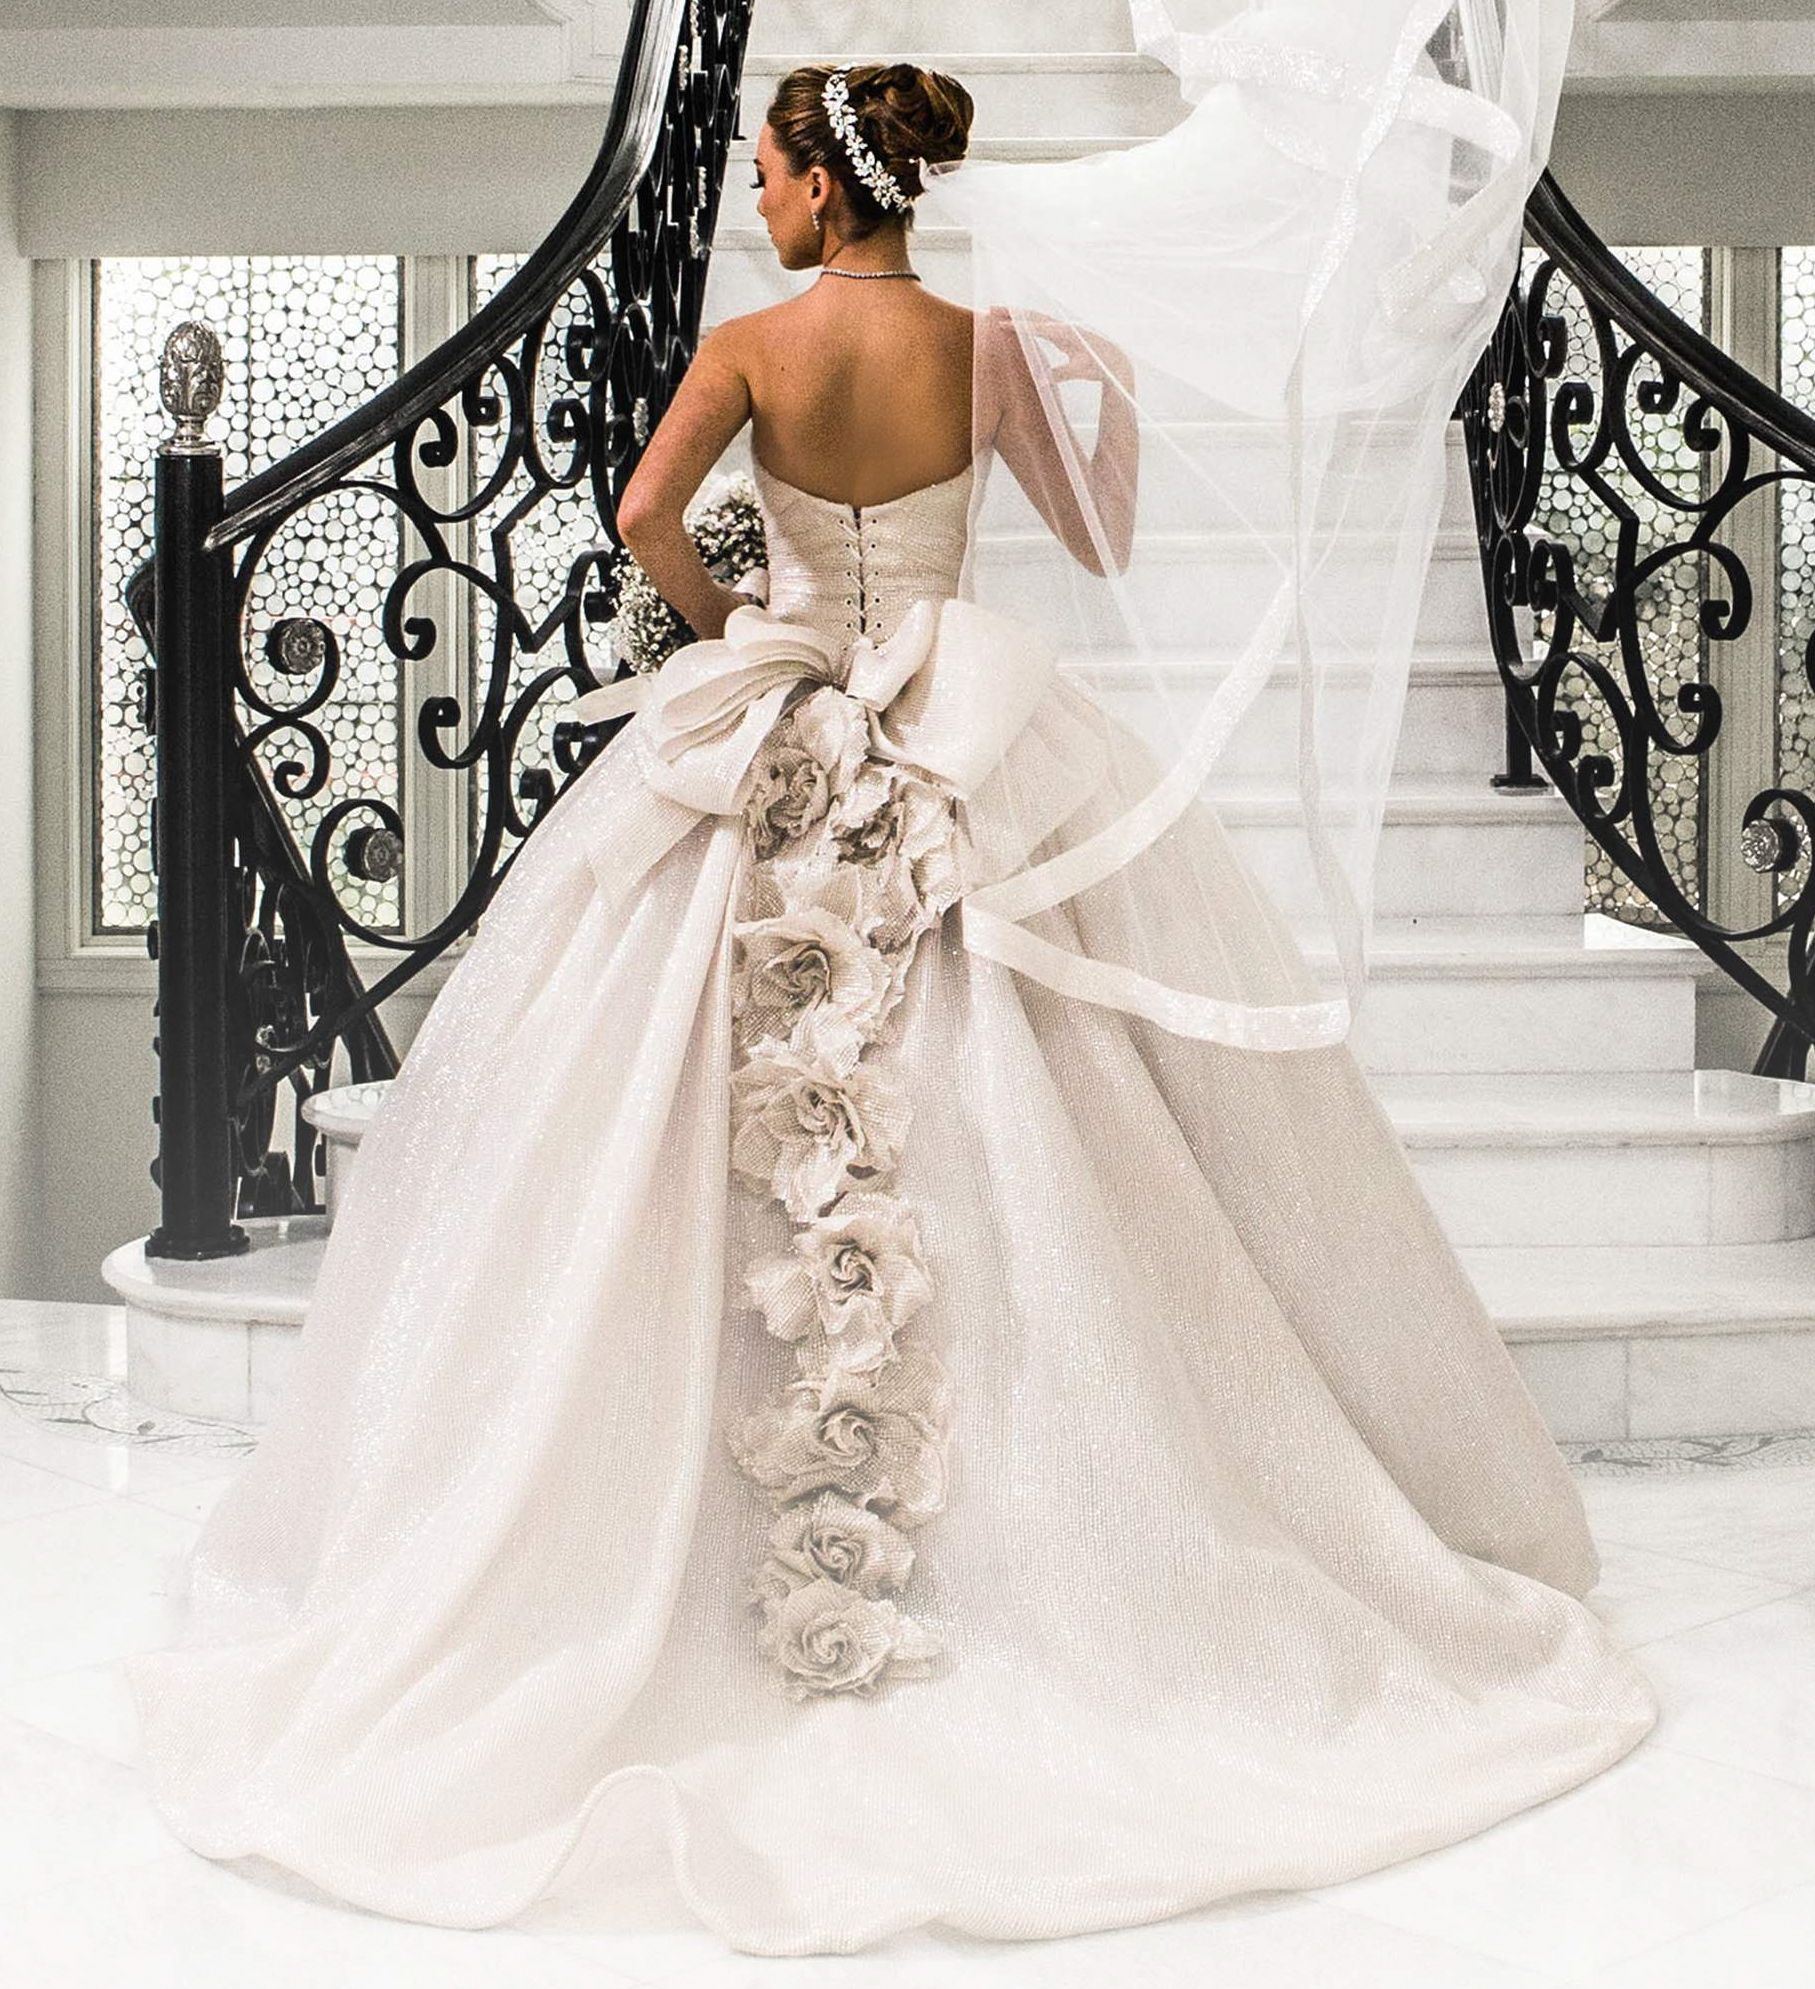 Used Pnina Tornai 4197 Wedding Dress Size 2 10 000 Pnina Tornai Wedding Dress Beautiful Wedding Dresses Wedding Dresses